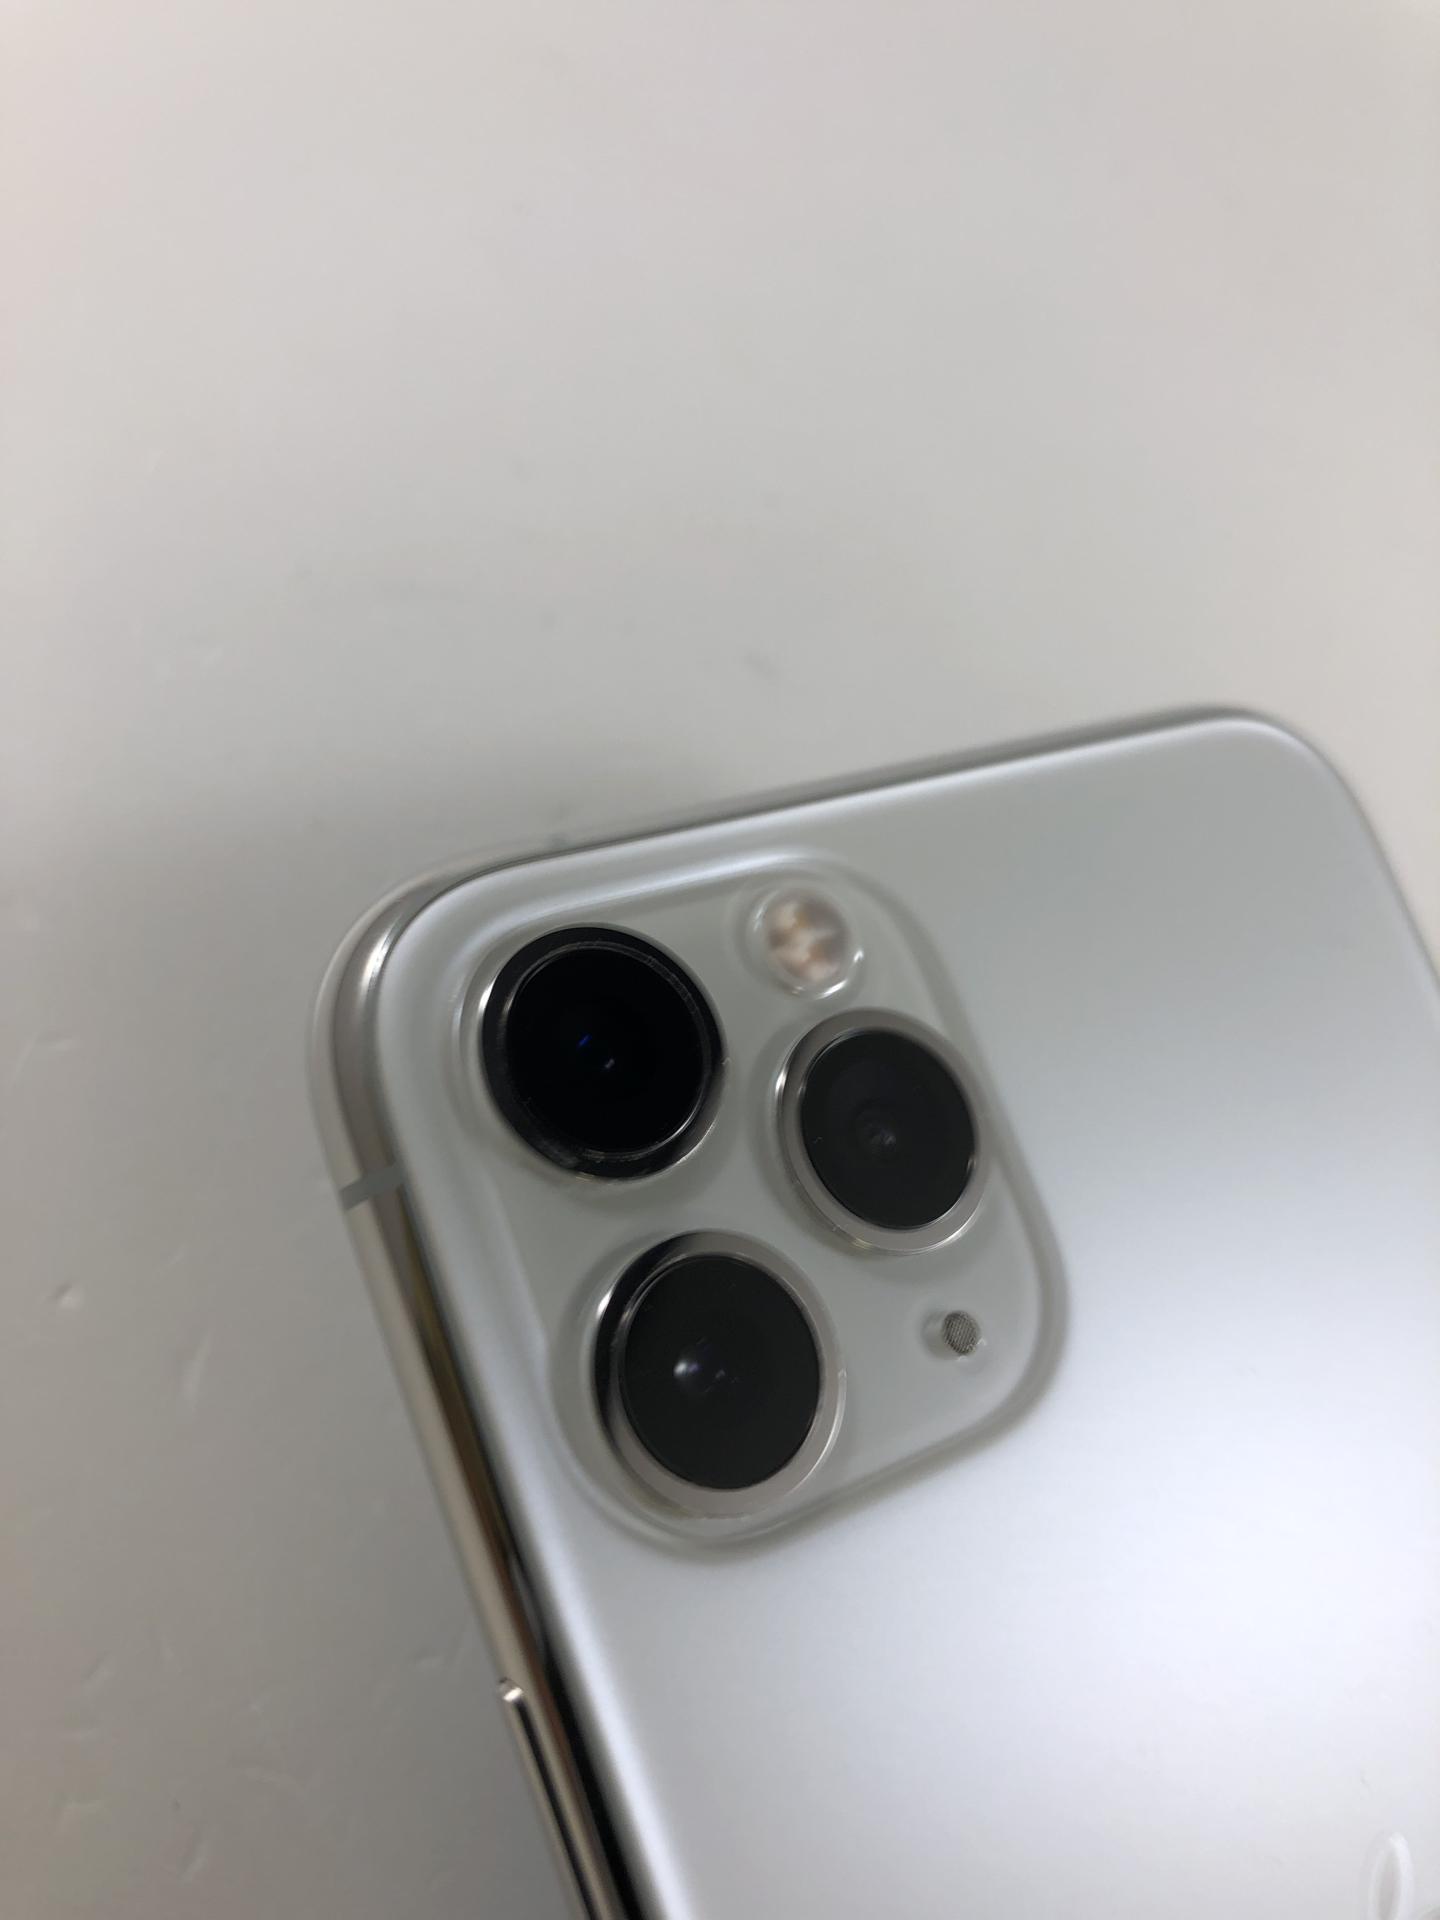 iPhone 11 Pro 256GB, 256GB, Silver, obraz 4